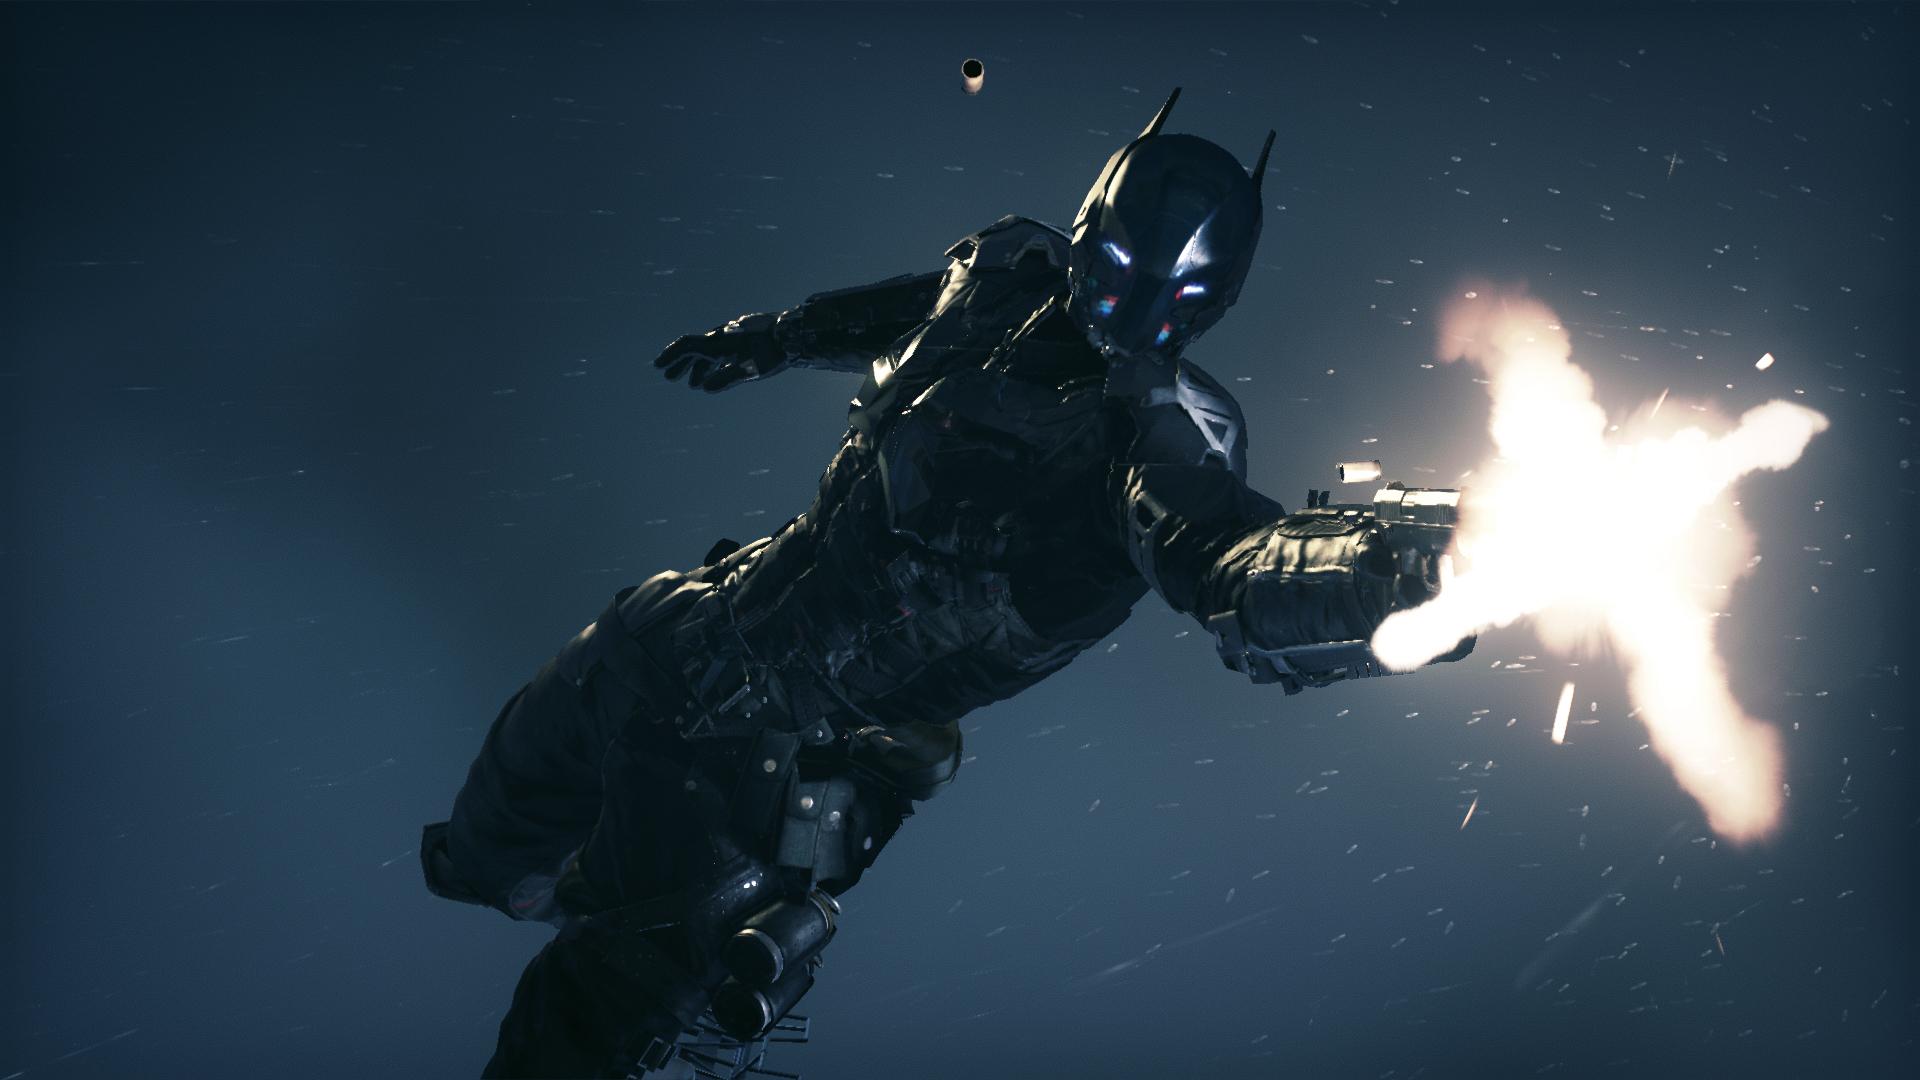 Batman: Arkham Knight Video Games 34 Cool Hd Wallpaper - Hivewallpaper ...